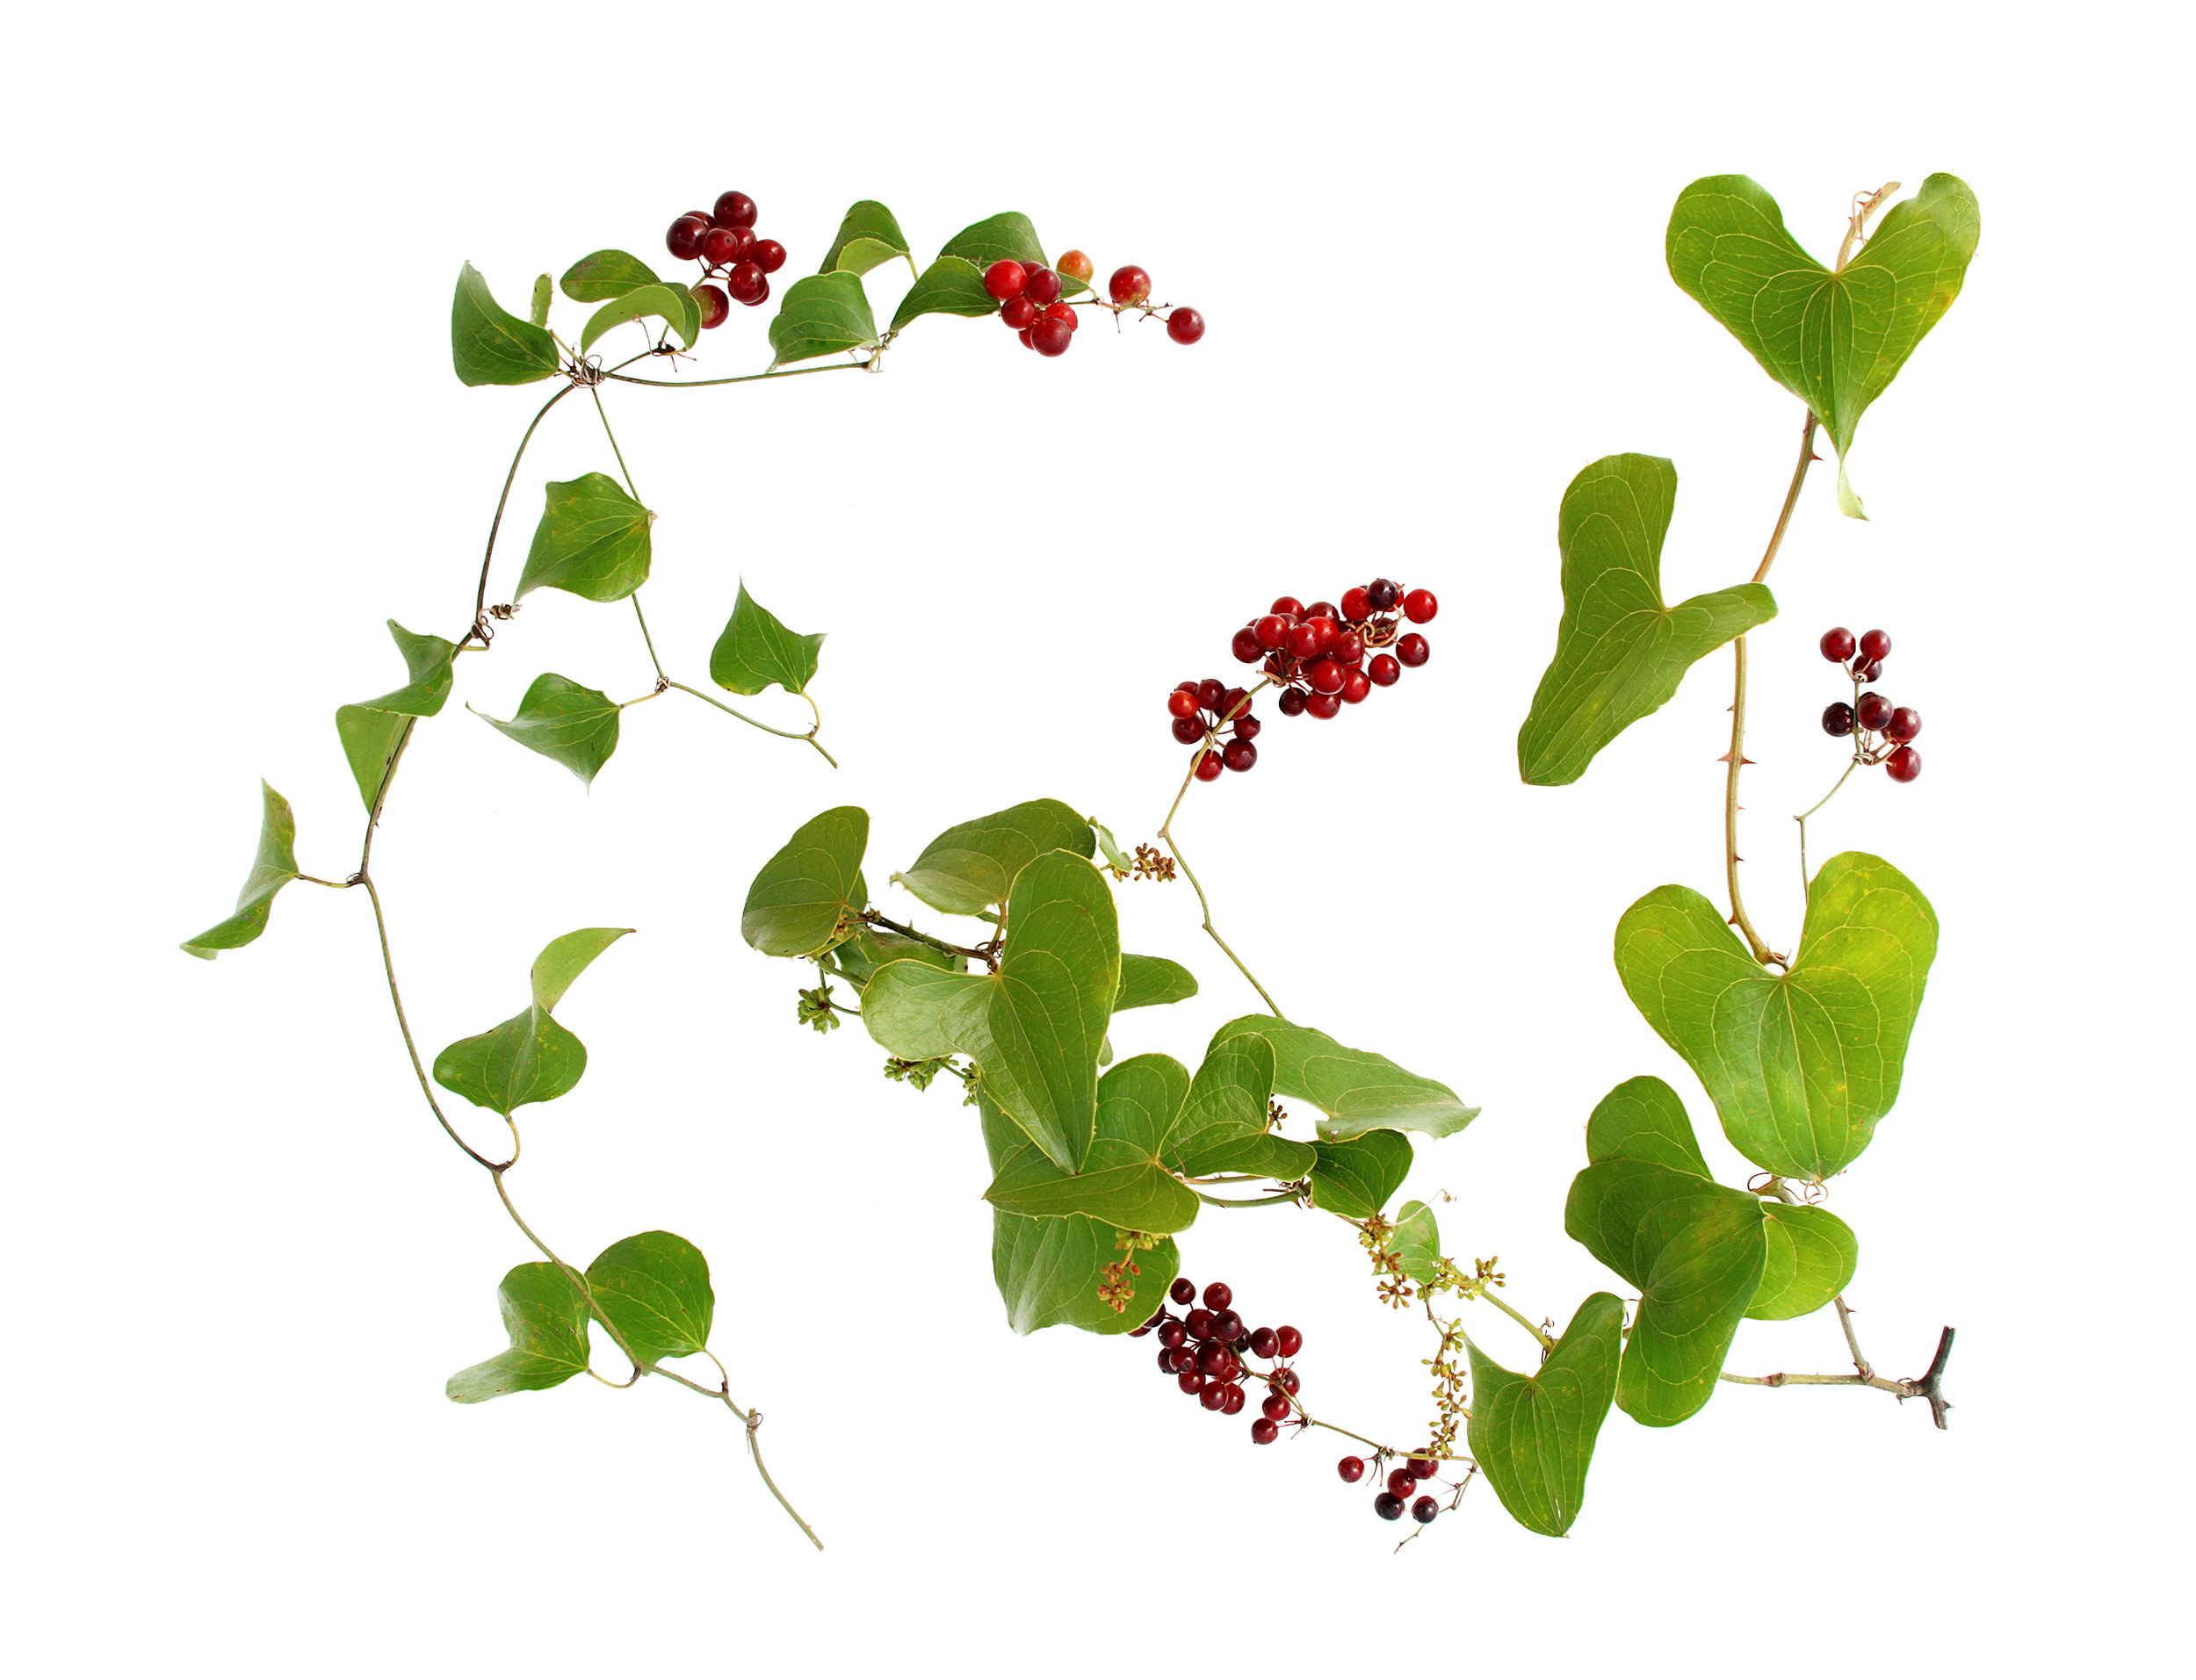 sarsaparilla plant